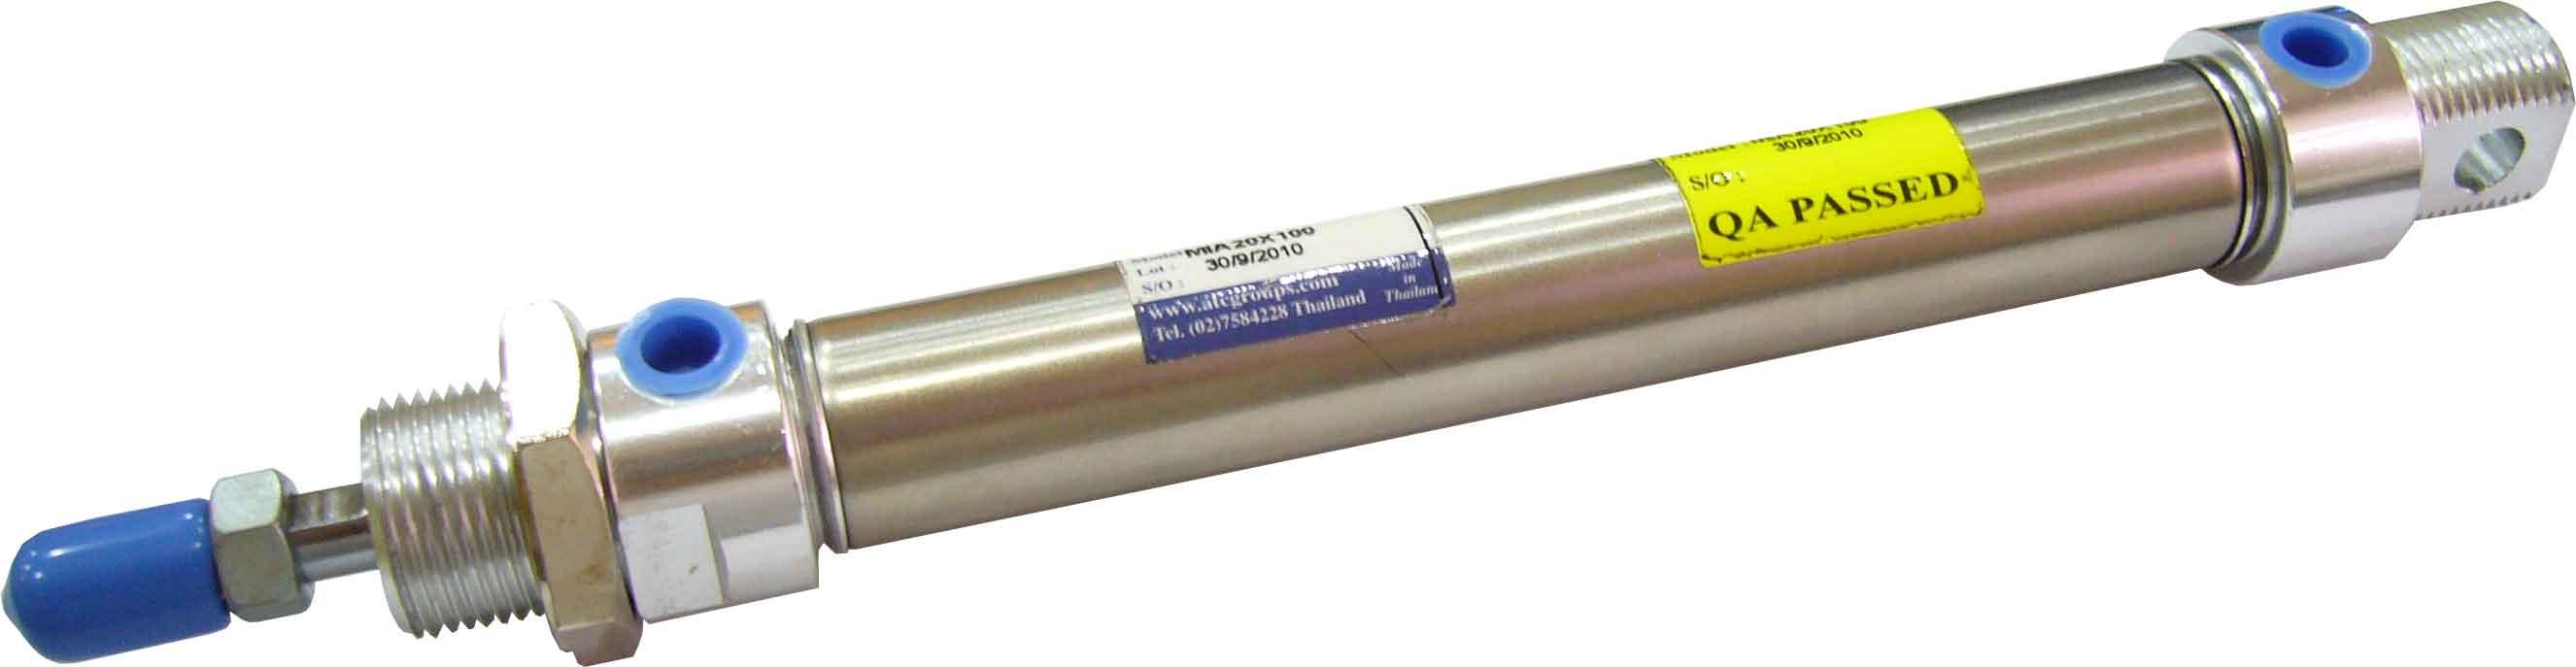 ISO6430 Stainless Steel Slim Cylinder (MIA MIAD MIAJ MIAT Series)